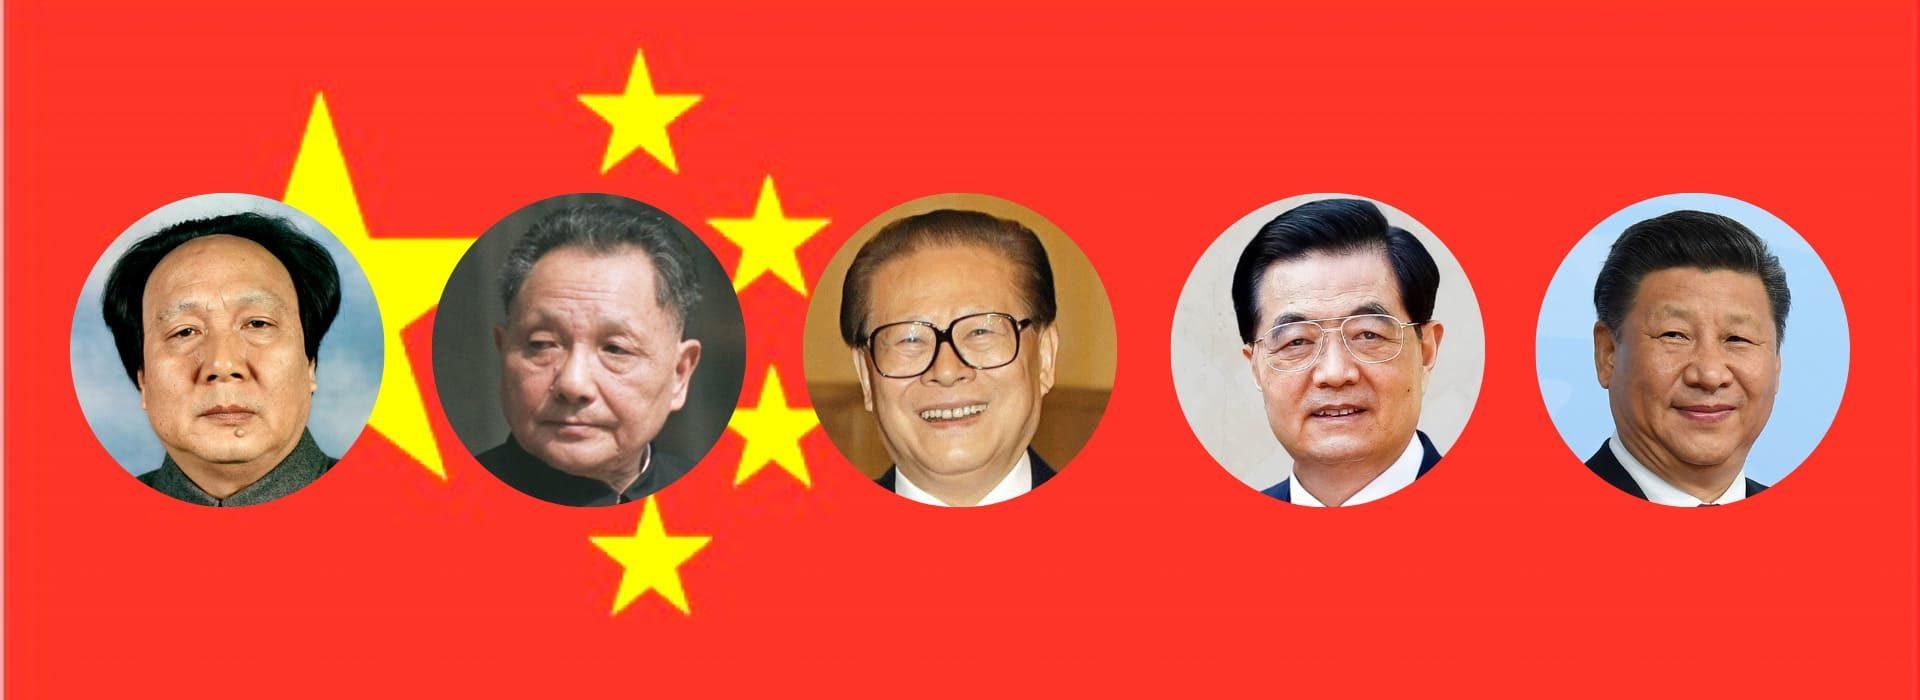 100 лет компартии Китая